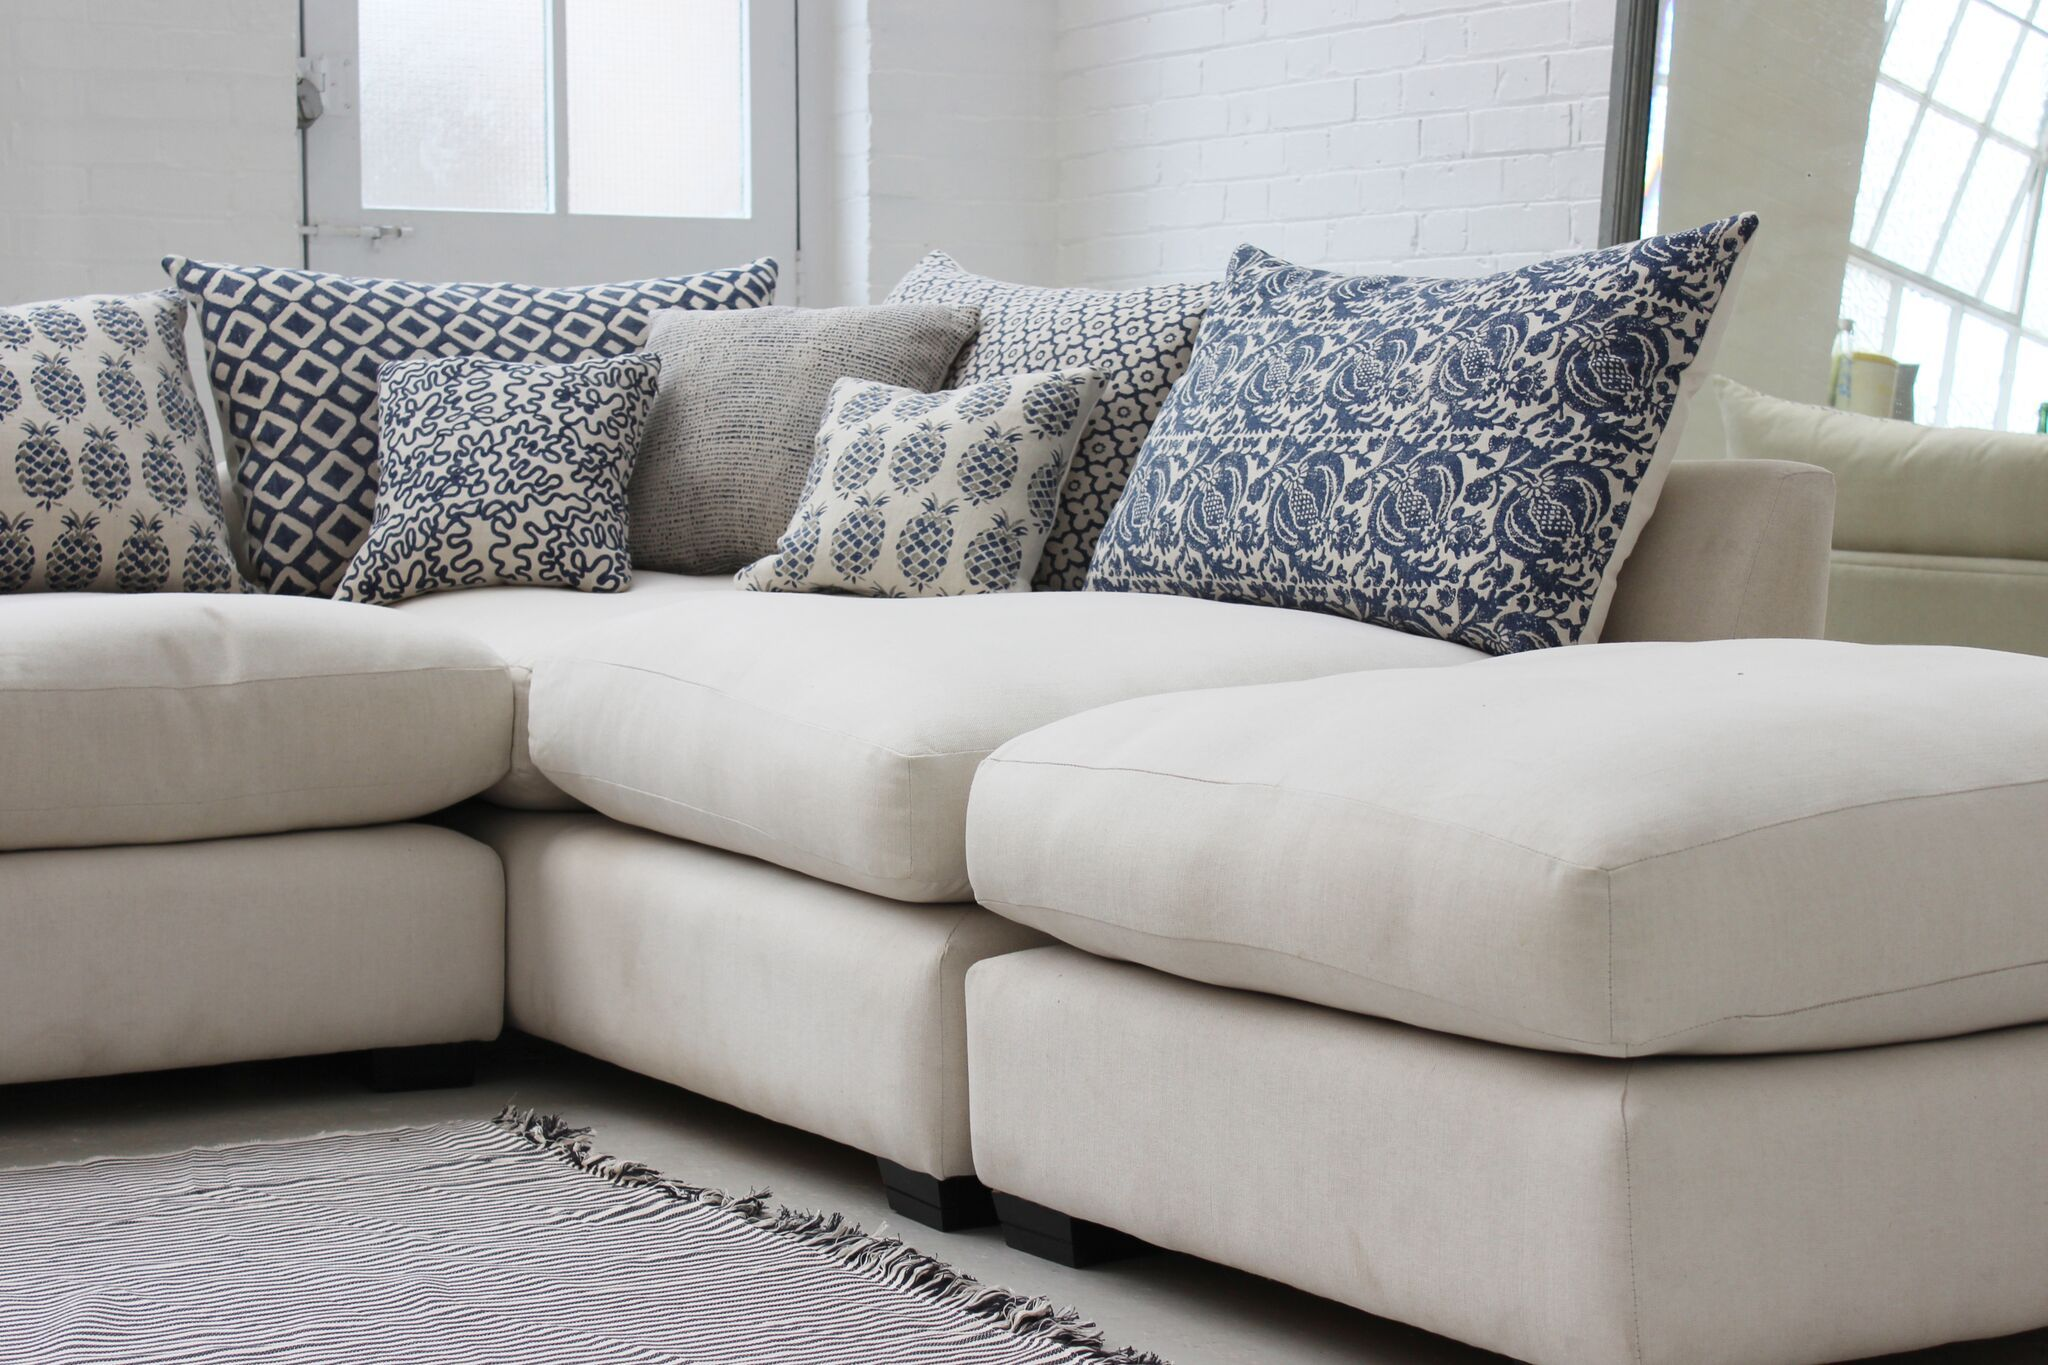 Hambledon in 2020 | Corner sofa throw, Corner sofa, Grey ...